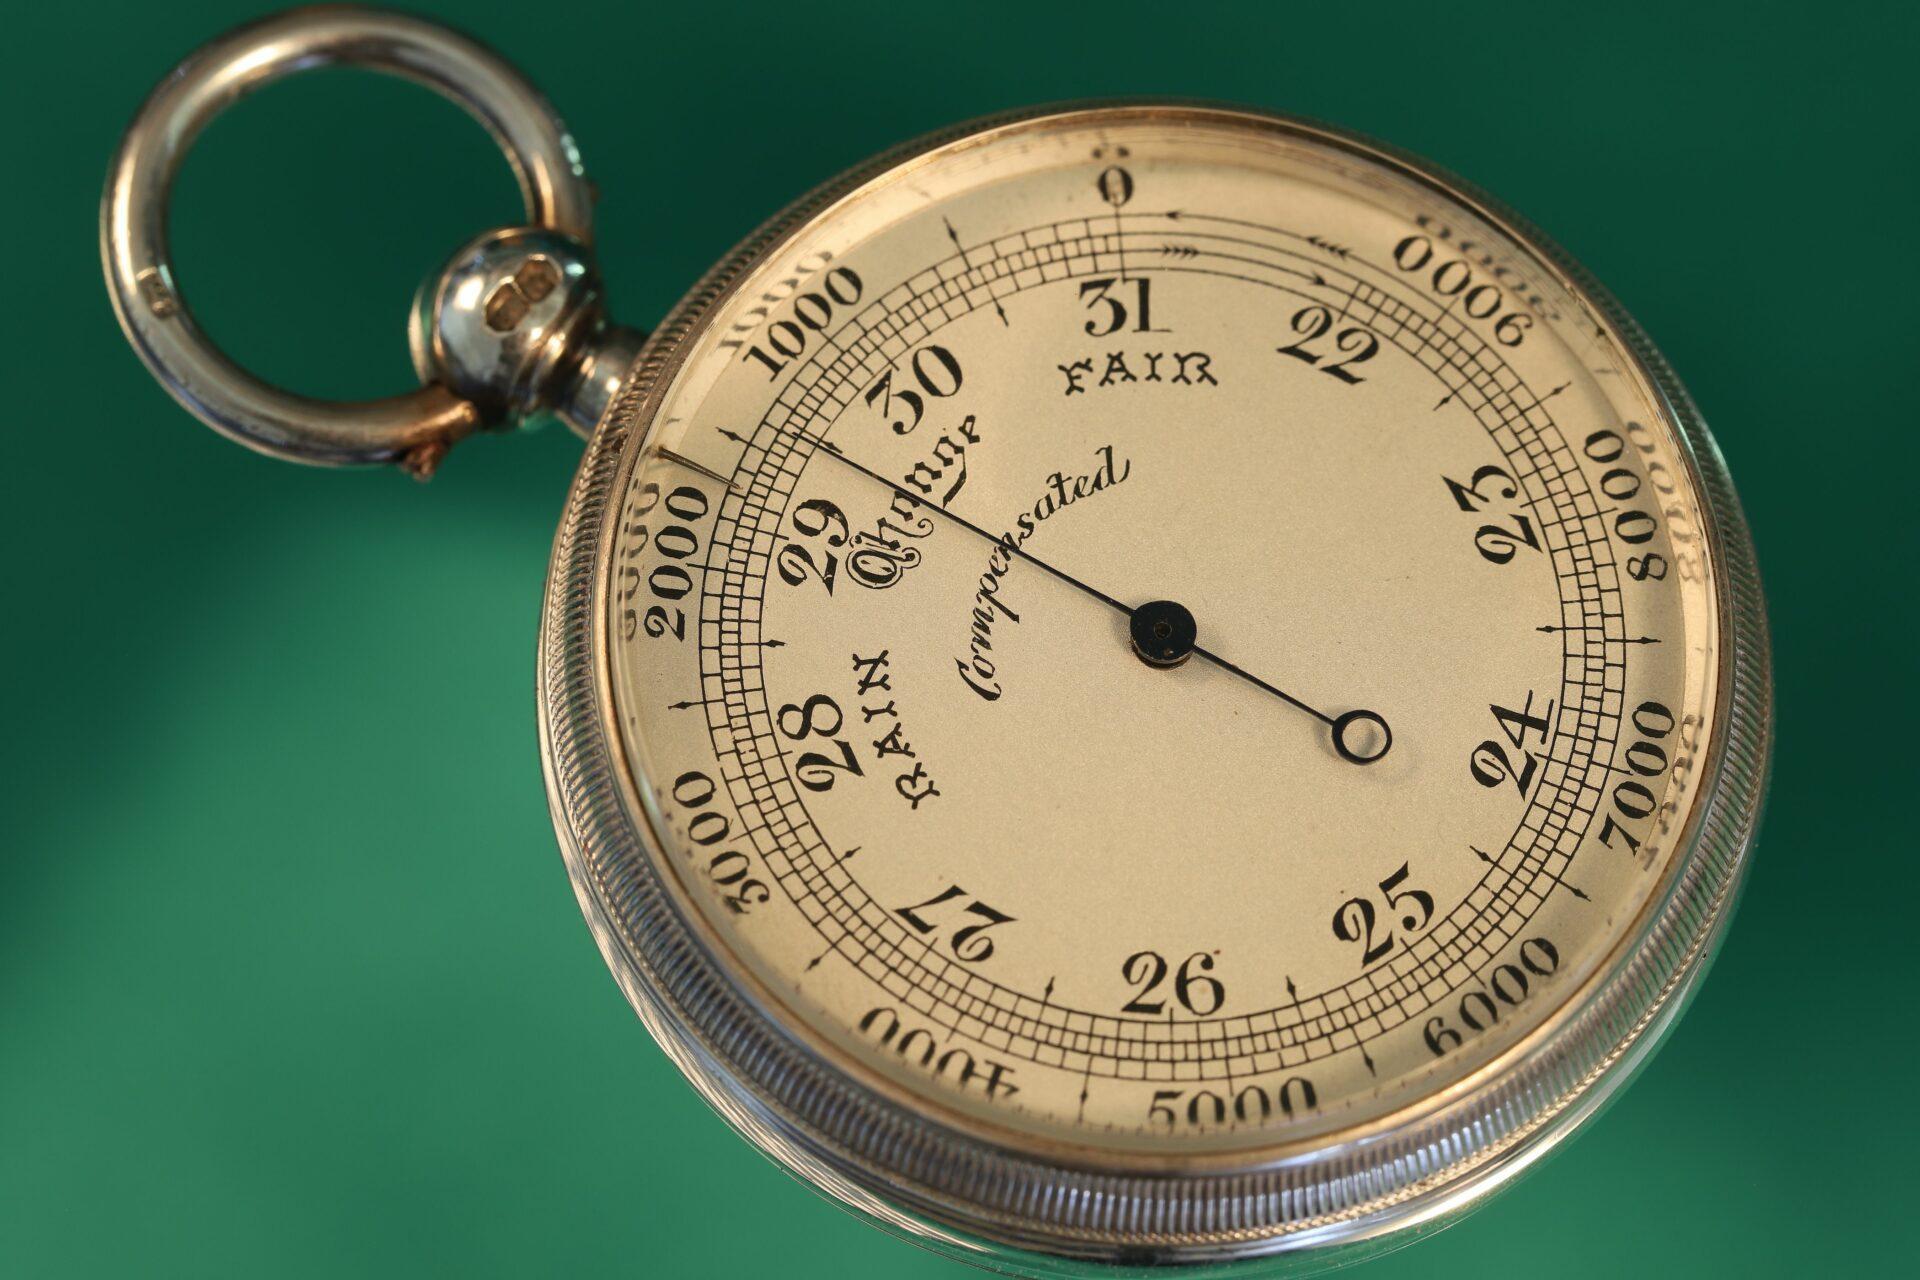 Horizontal image of pocket barometer from Cairns Silver Pocket Barometer Compendium c1892